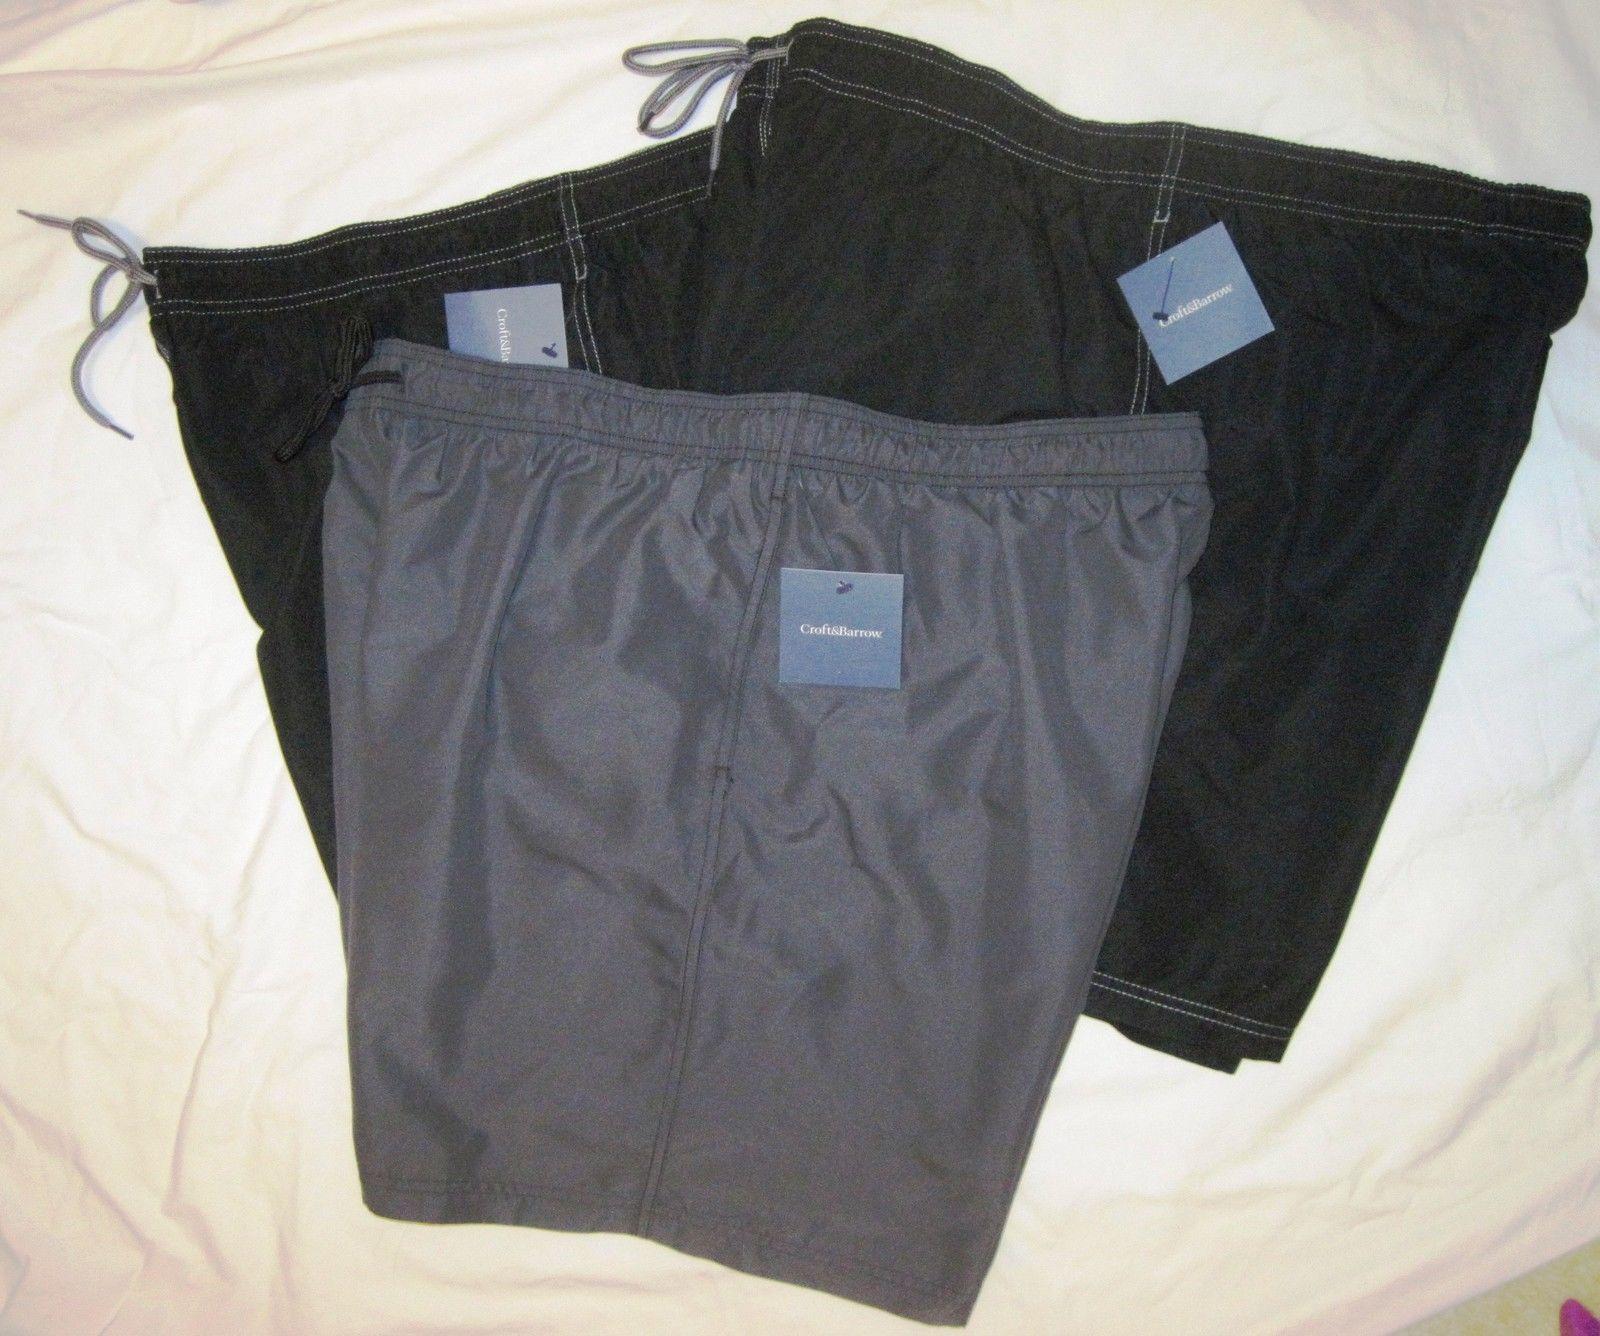 NWT CROFT & BARROW Swim Bathing Suit Trunks Mens XXL black or gray solid Poly